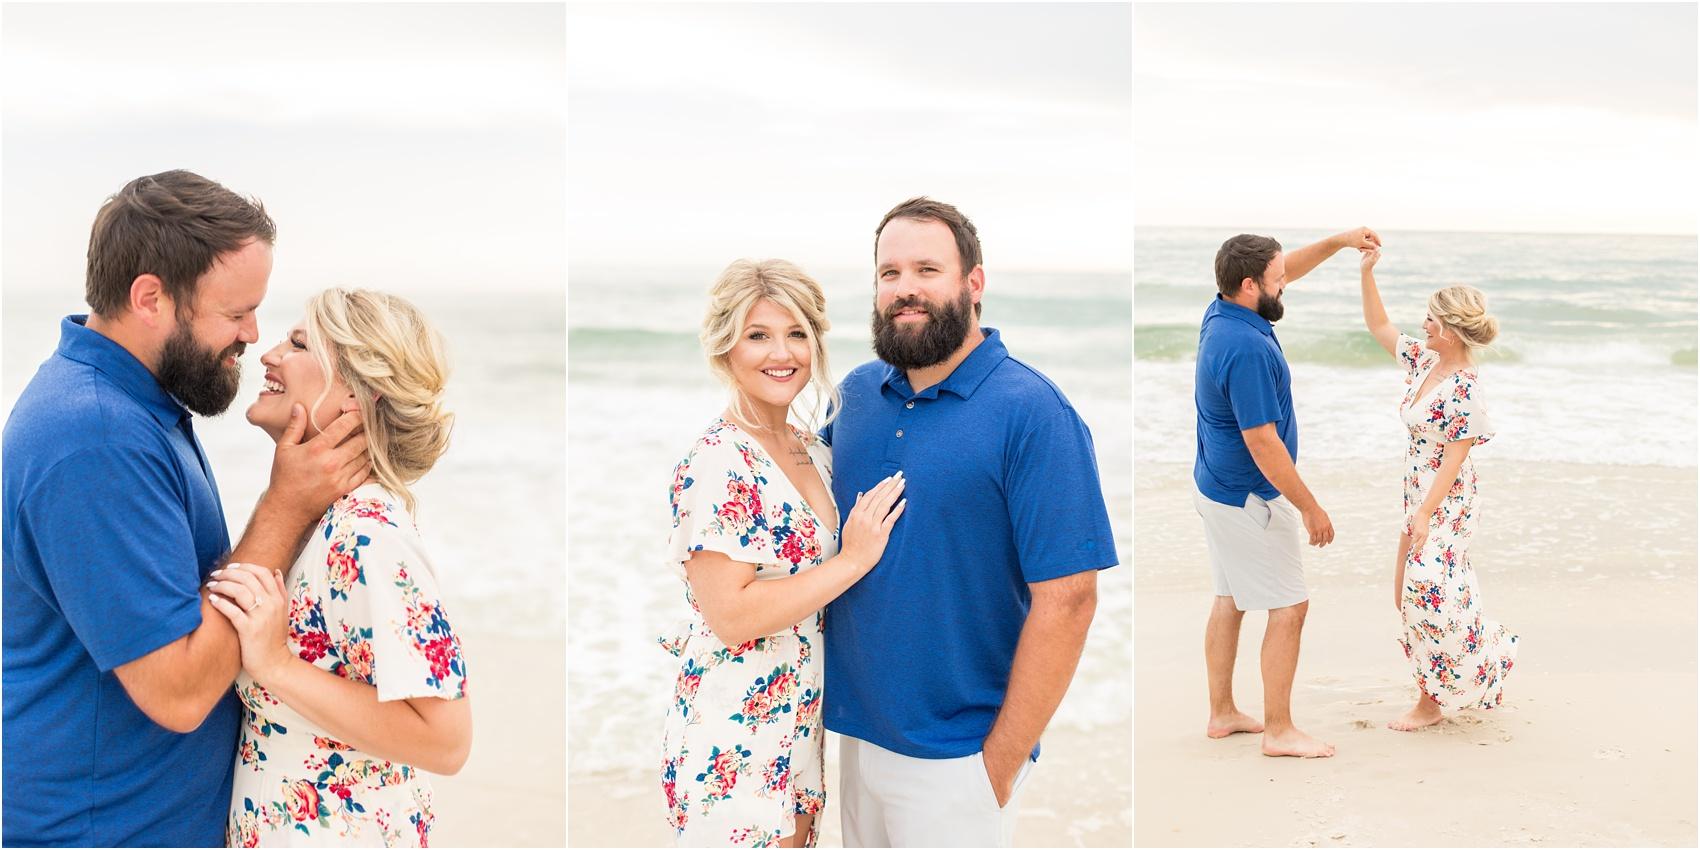 Savannah Eve Photography- Madison & Tim's Engagements-6.jpg